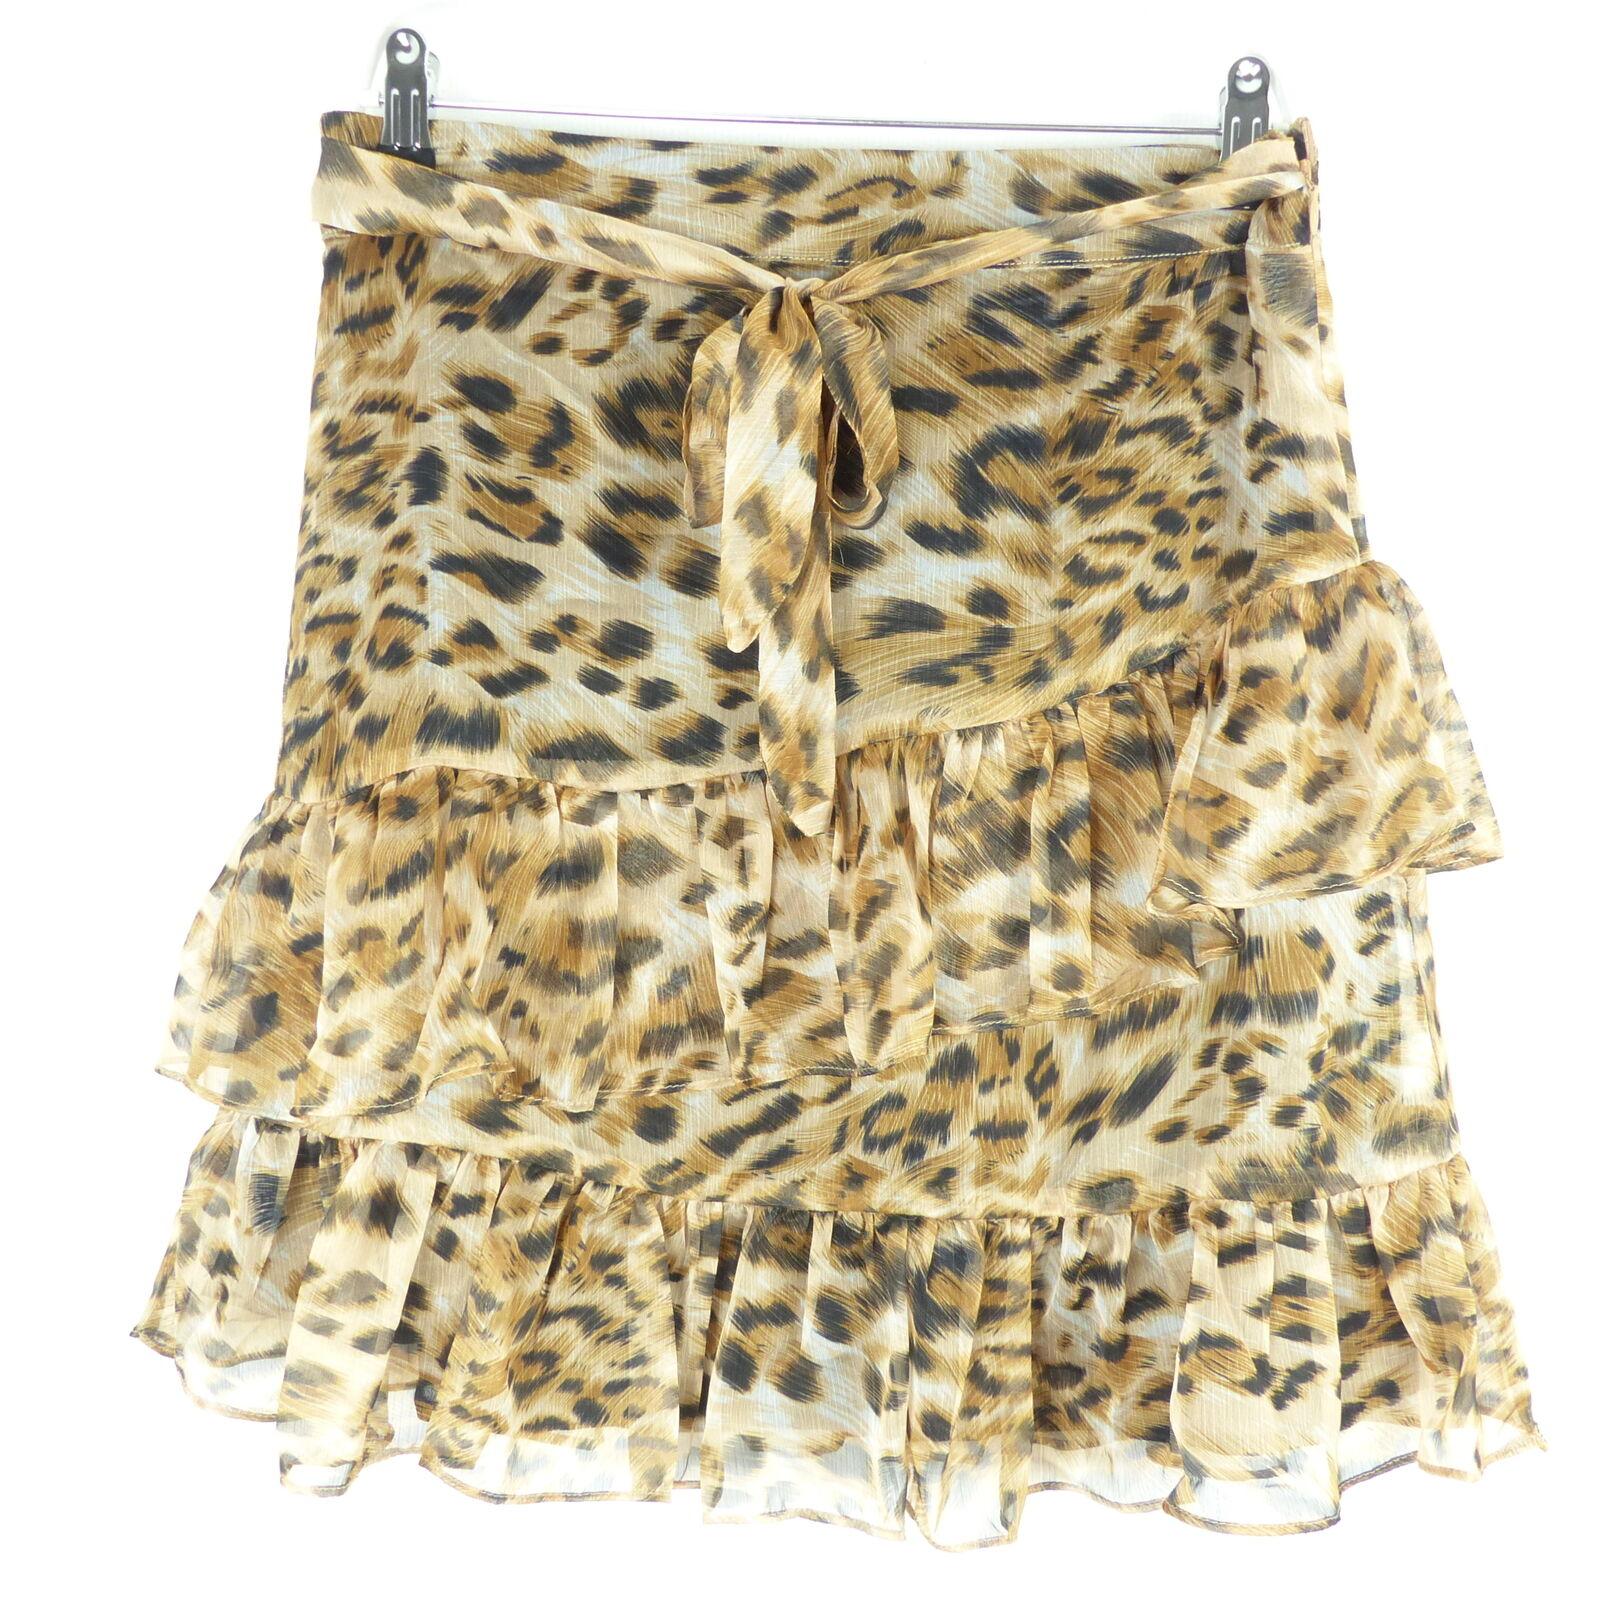 Sofie Schnoor gonna skirt leopard leopard leopard animale pelliccia tg S 36 efc2b8